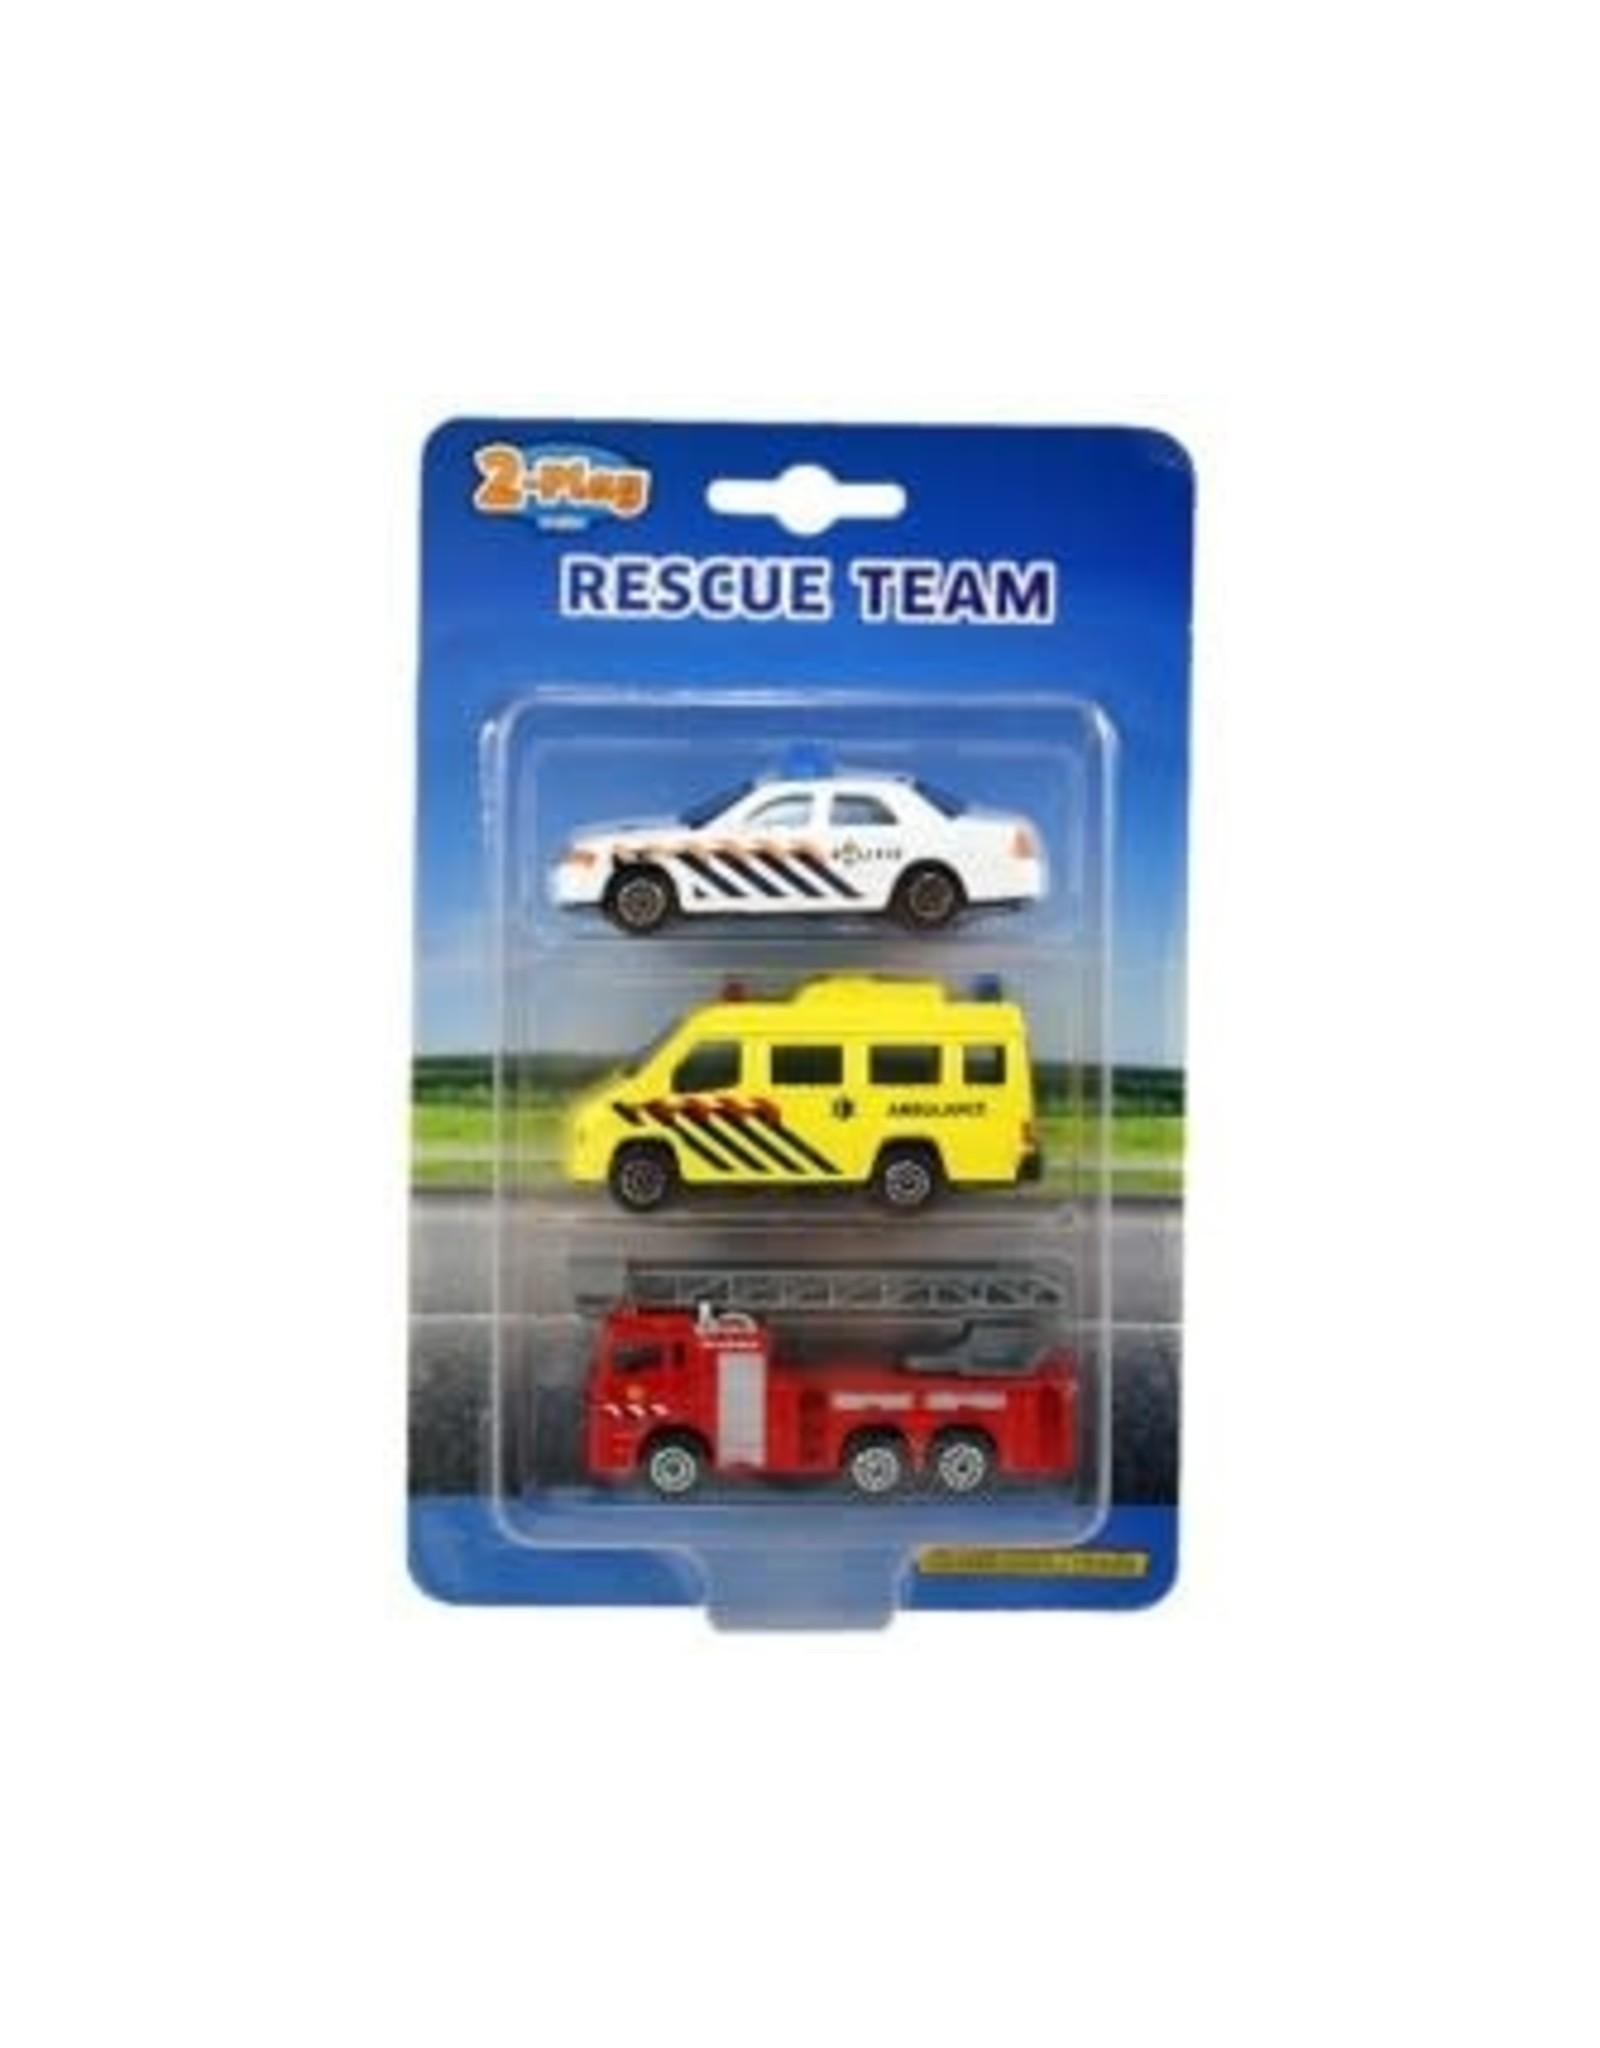 2-Play reddingsteam voertuigen - 3 stuks